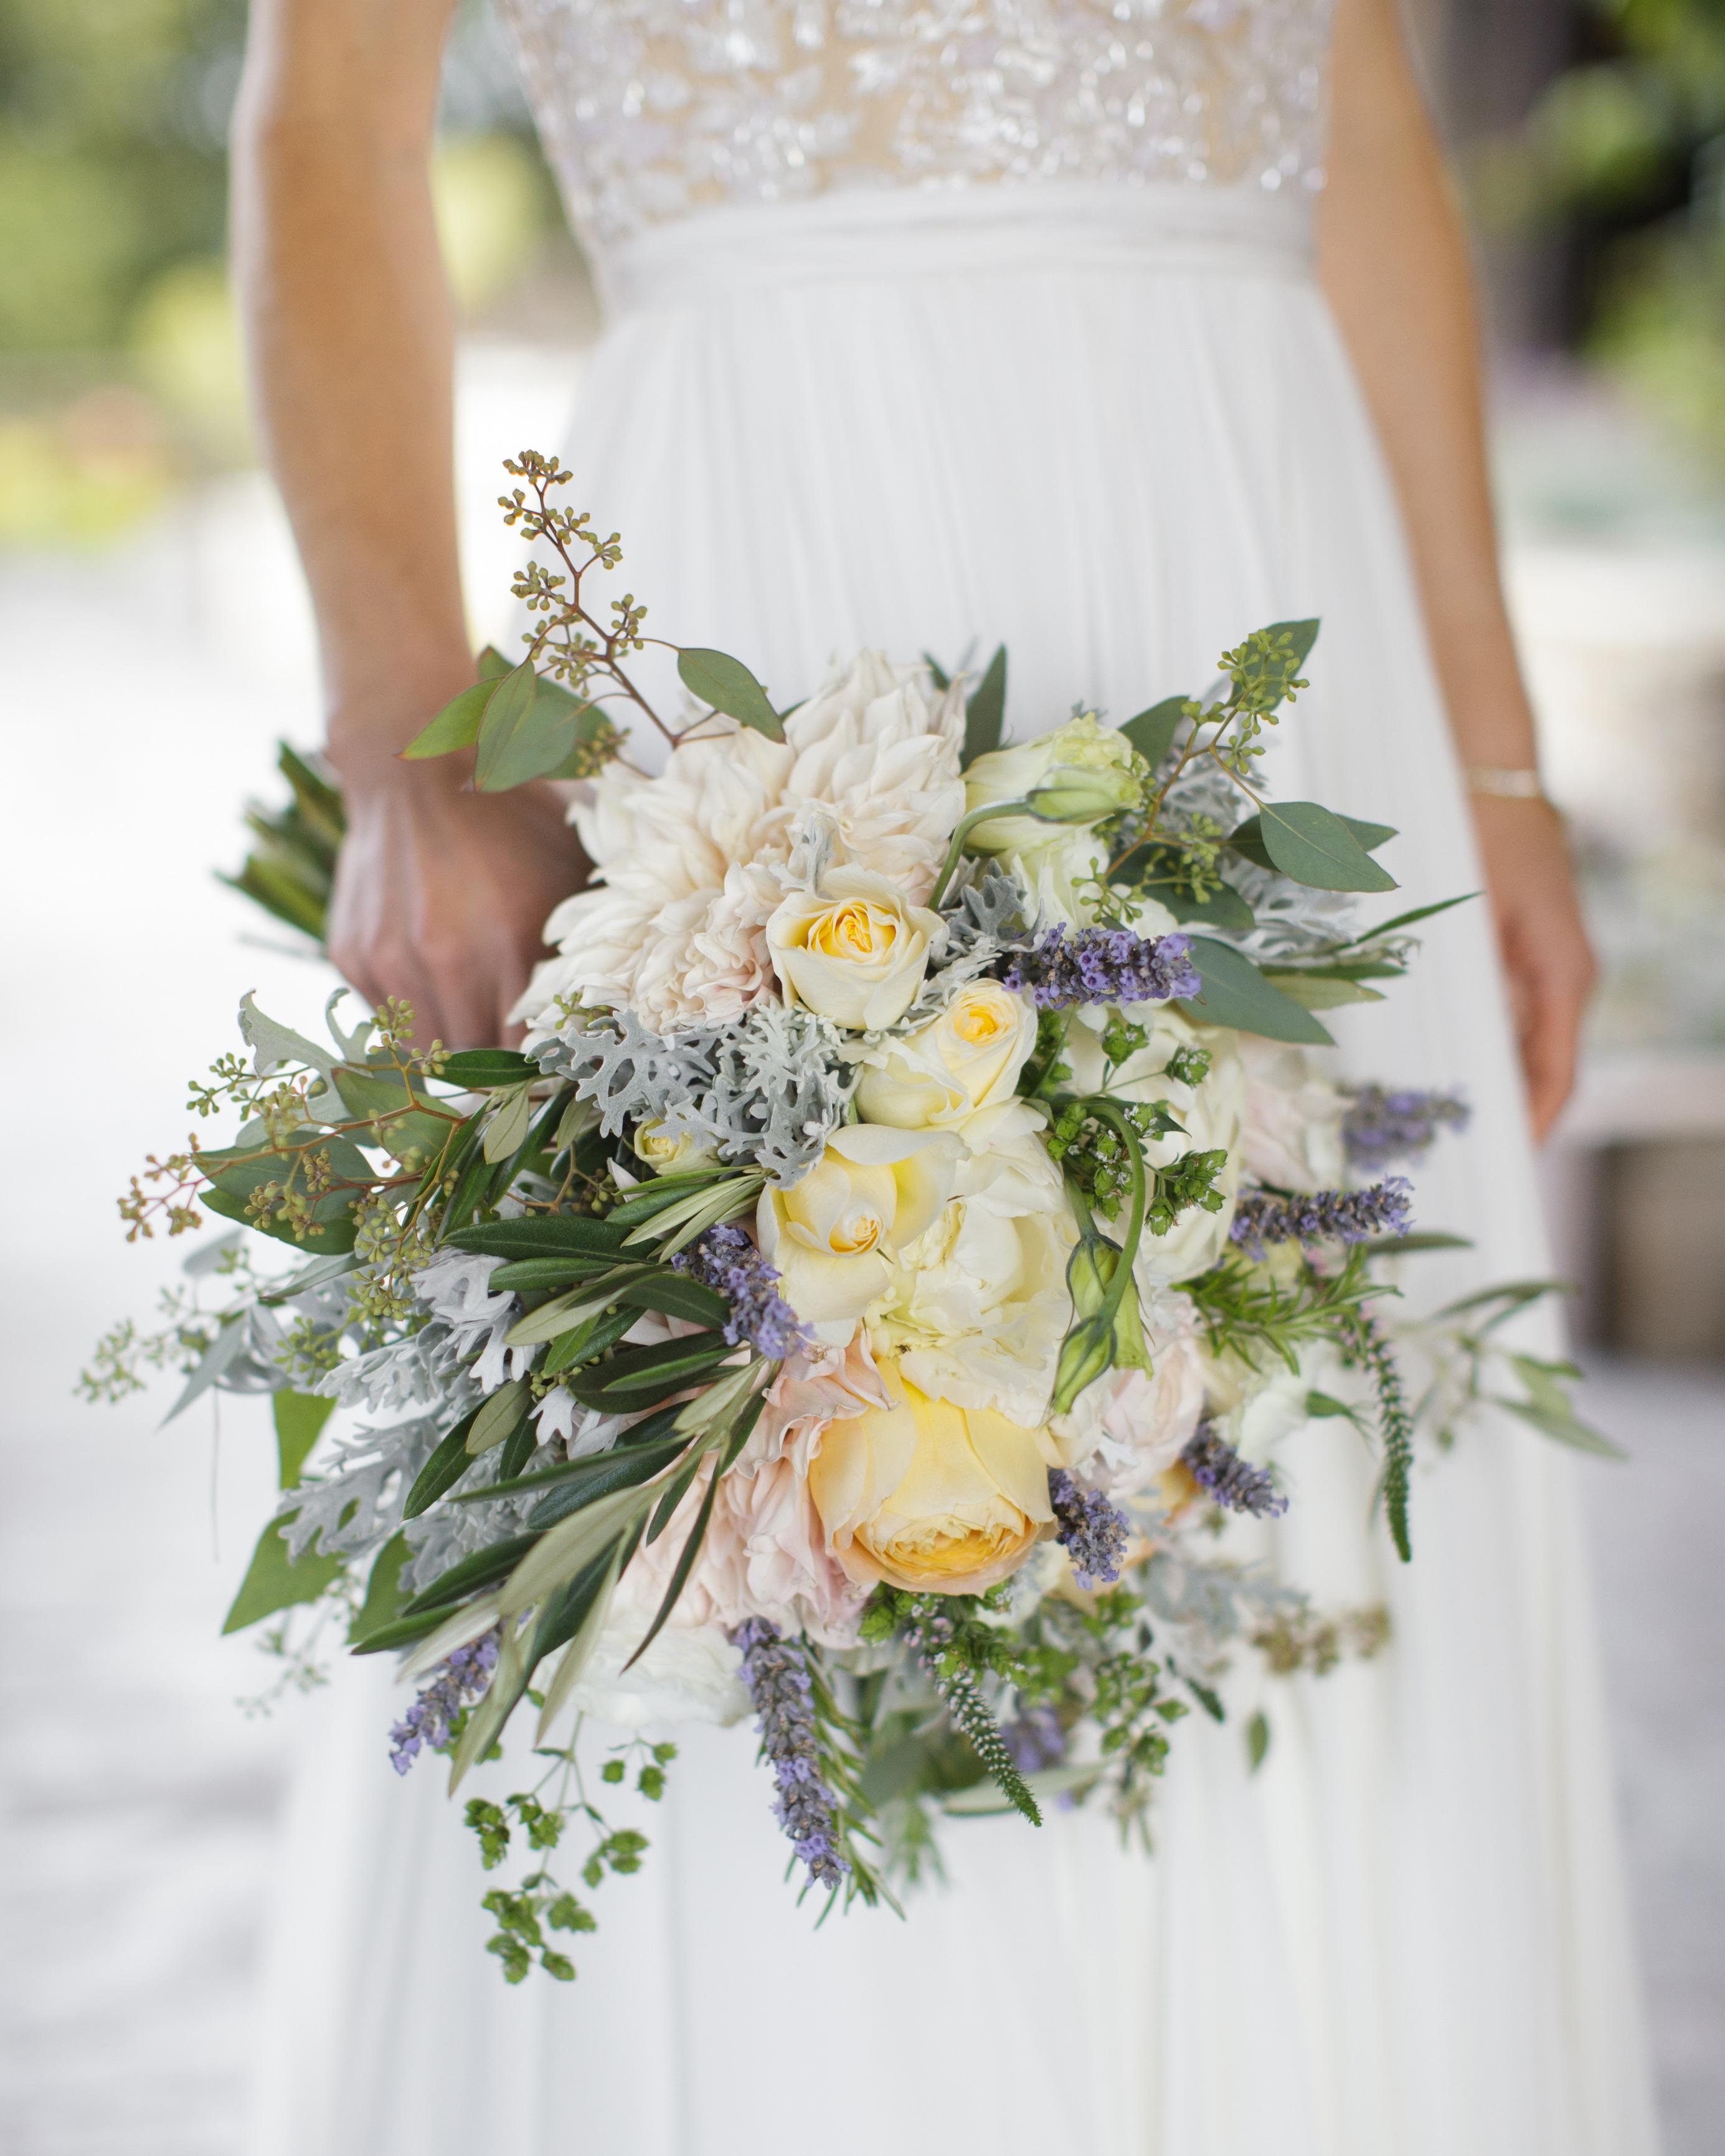 kristin-chris-wedding-bouquet-158-s112398-0116.jpg